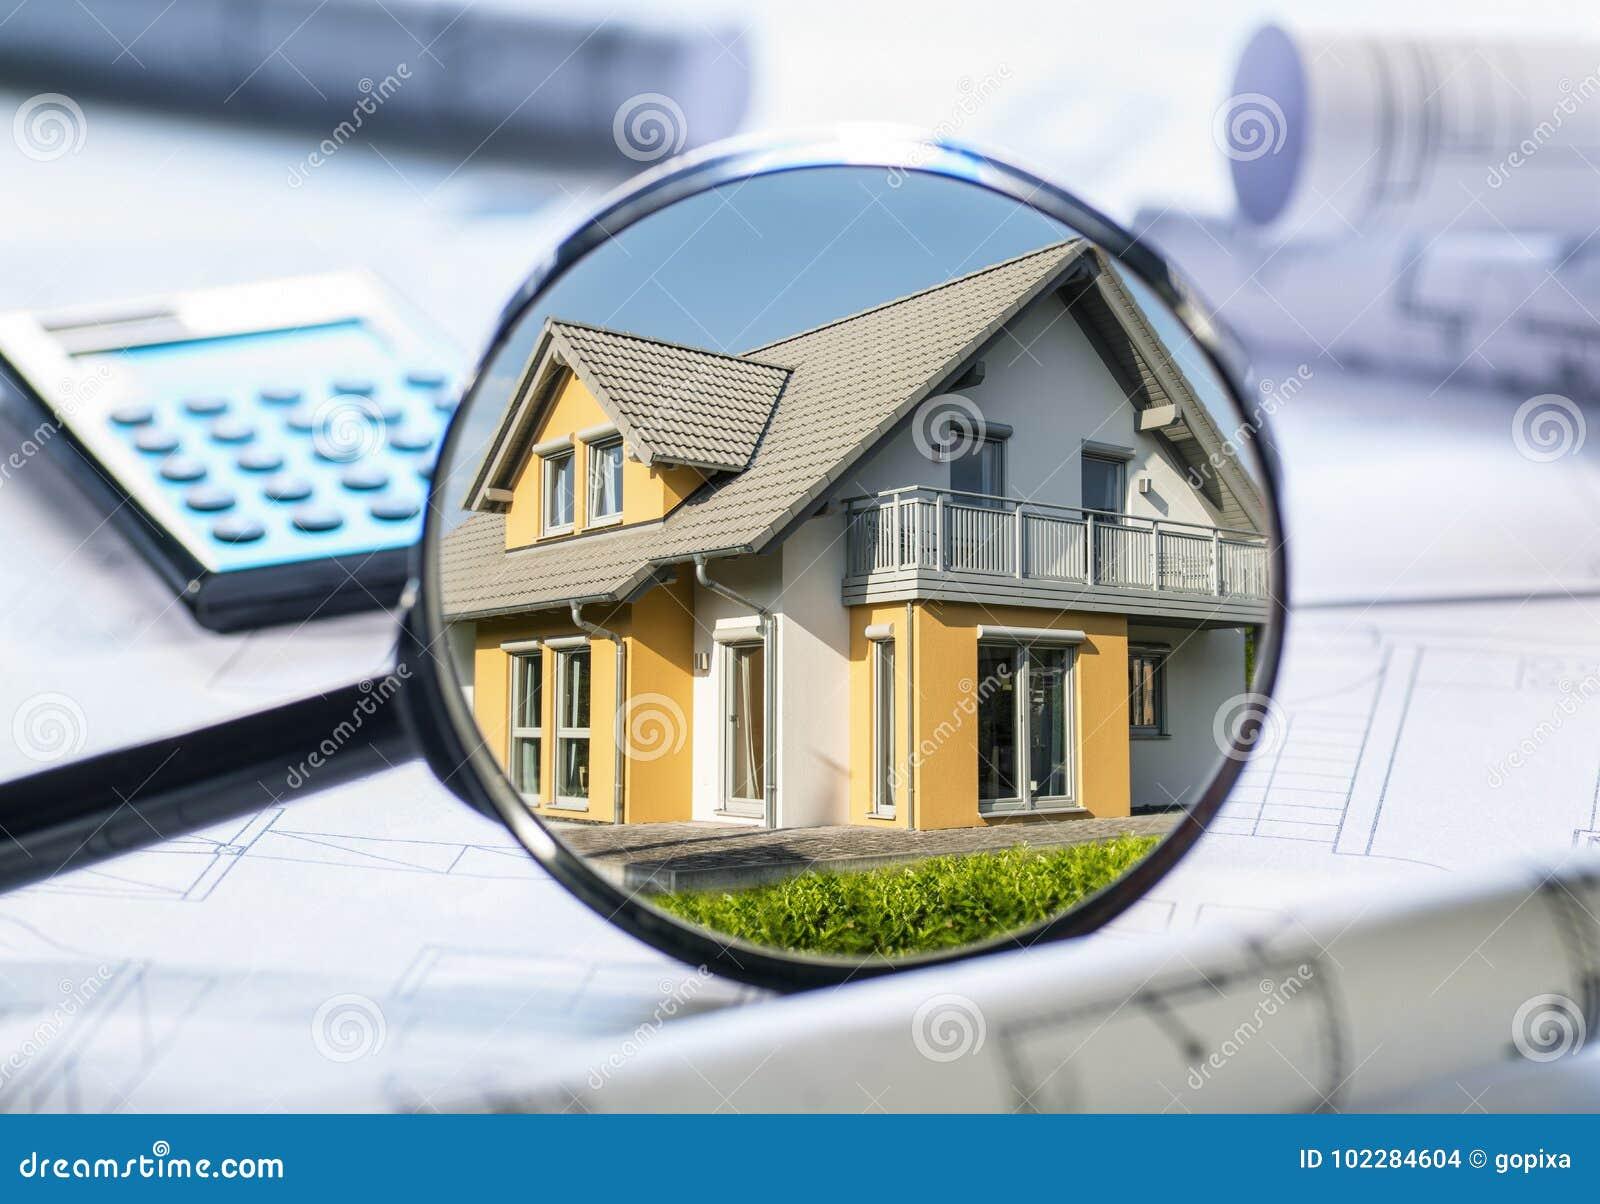 Immobilien im Fokus